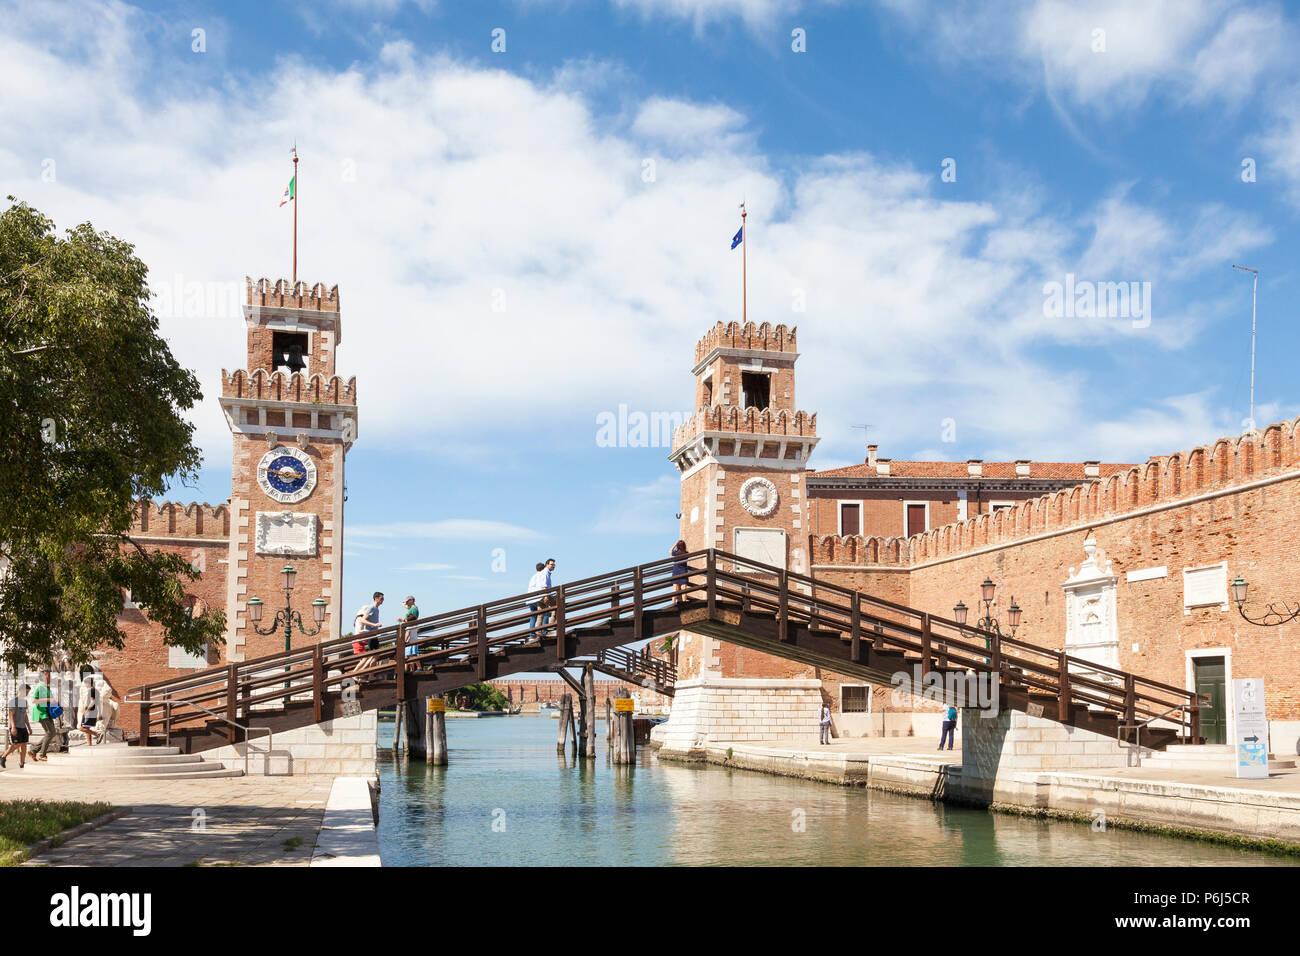 Entrance to the Arsenale, Castello, Venice, Italy on Rio de l'Arsenal with tourists on Ponte de l'Arsenal o del Paradiso bridge, Medieval Naval shipya - Stock Image